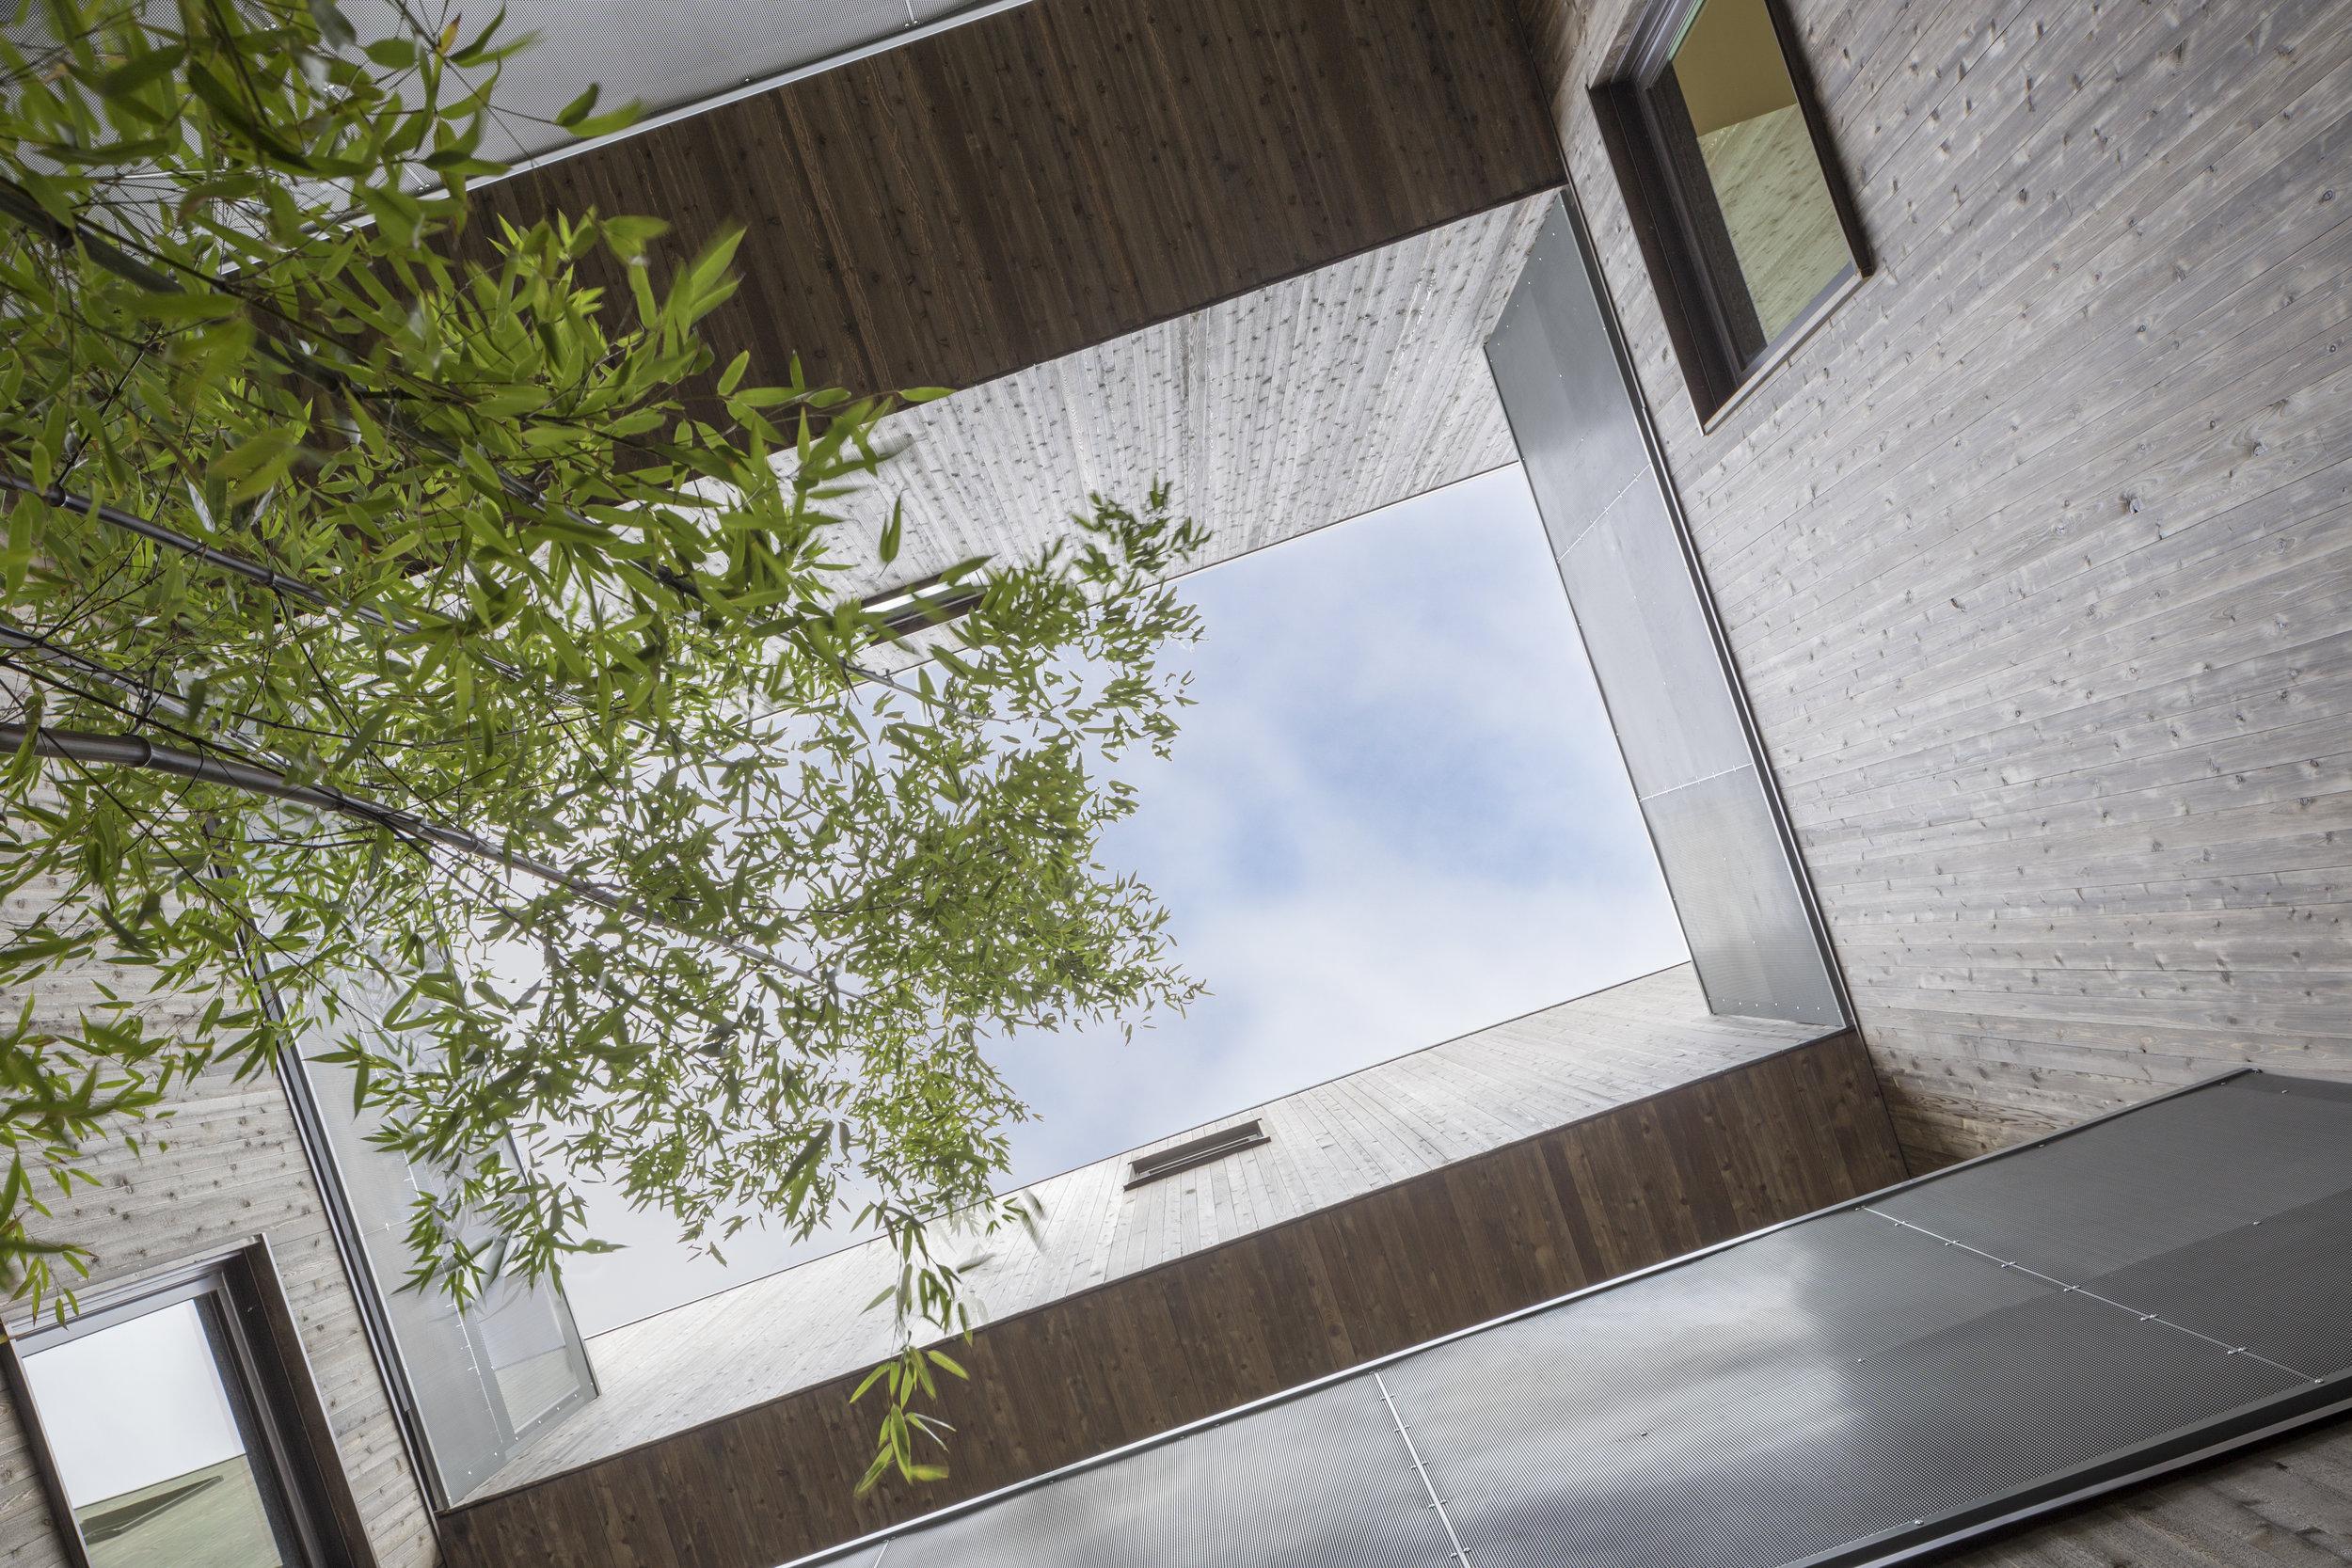 Doppleganger courtyard sky . WPA